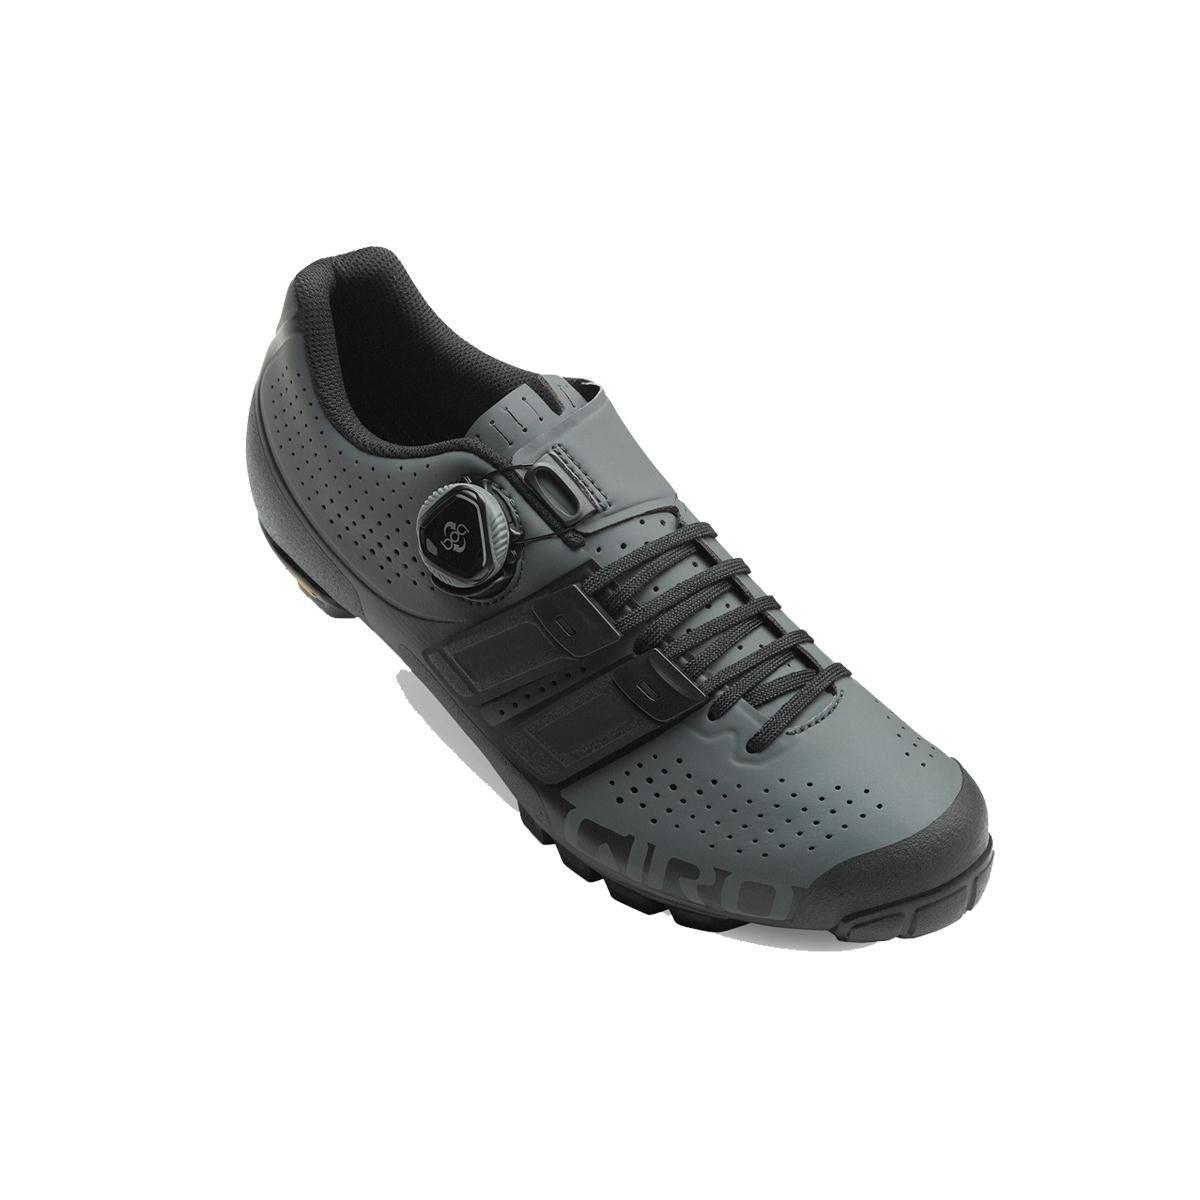 Giroコードtechlace Cycling Shoes – Men 's 44.5 M EU ダークシャドー/ブラック(Dark Shadow/Black) B075RR9XKB